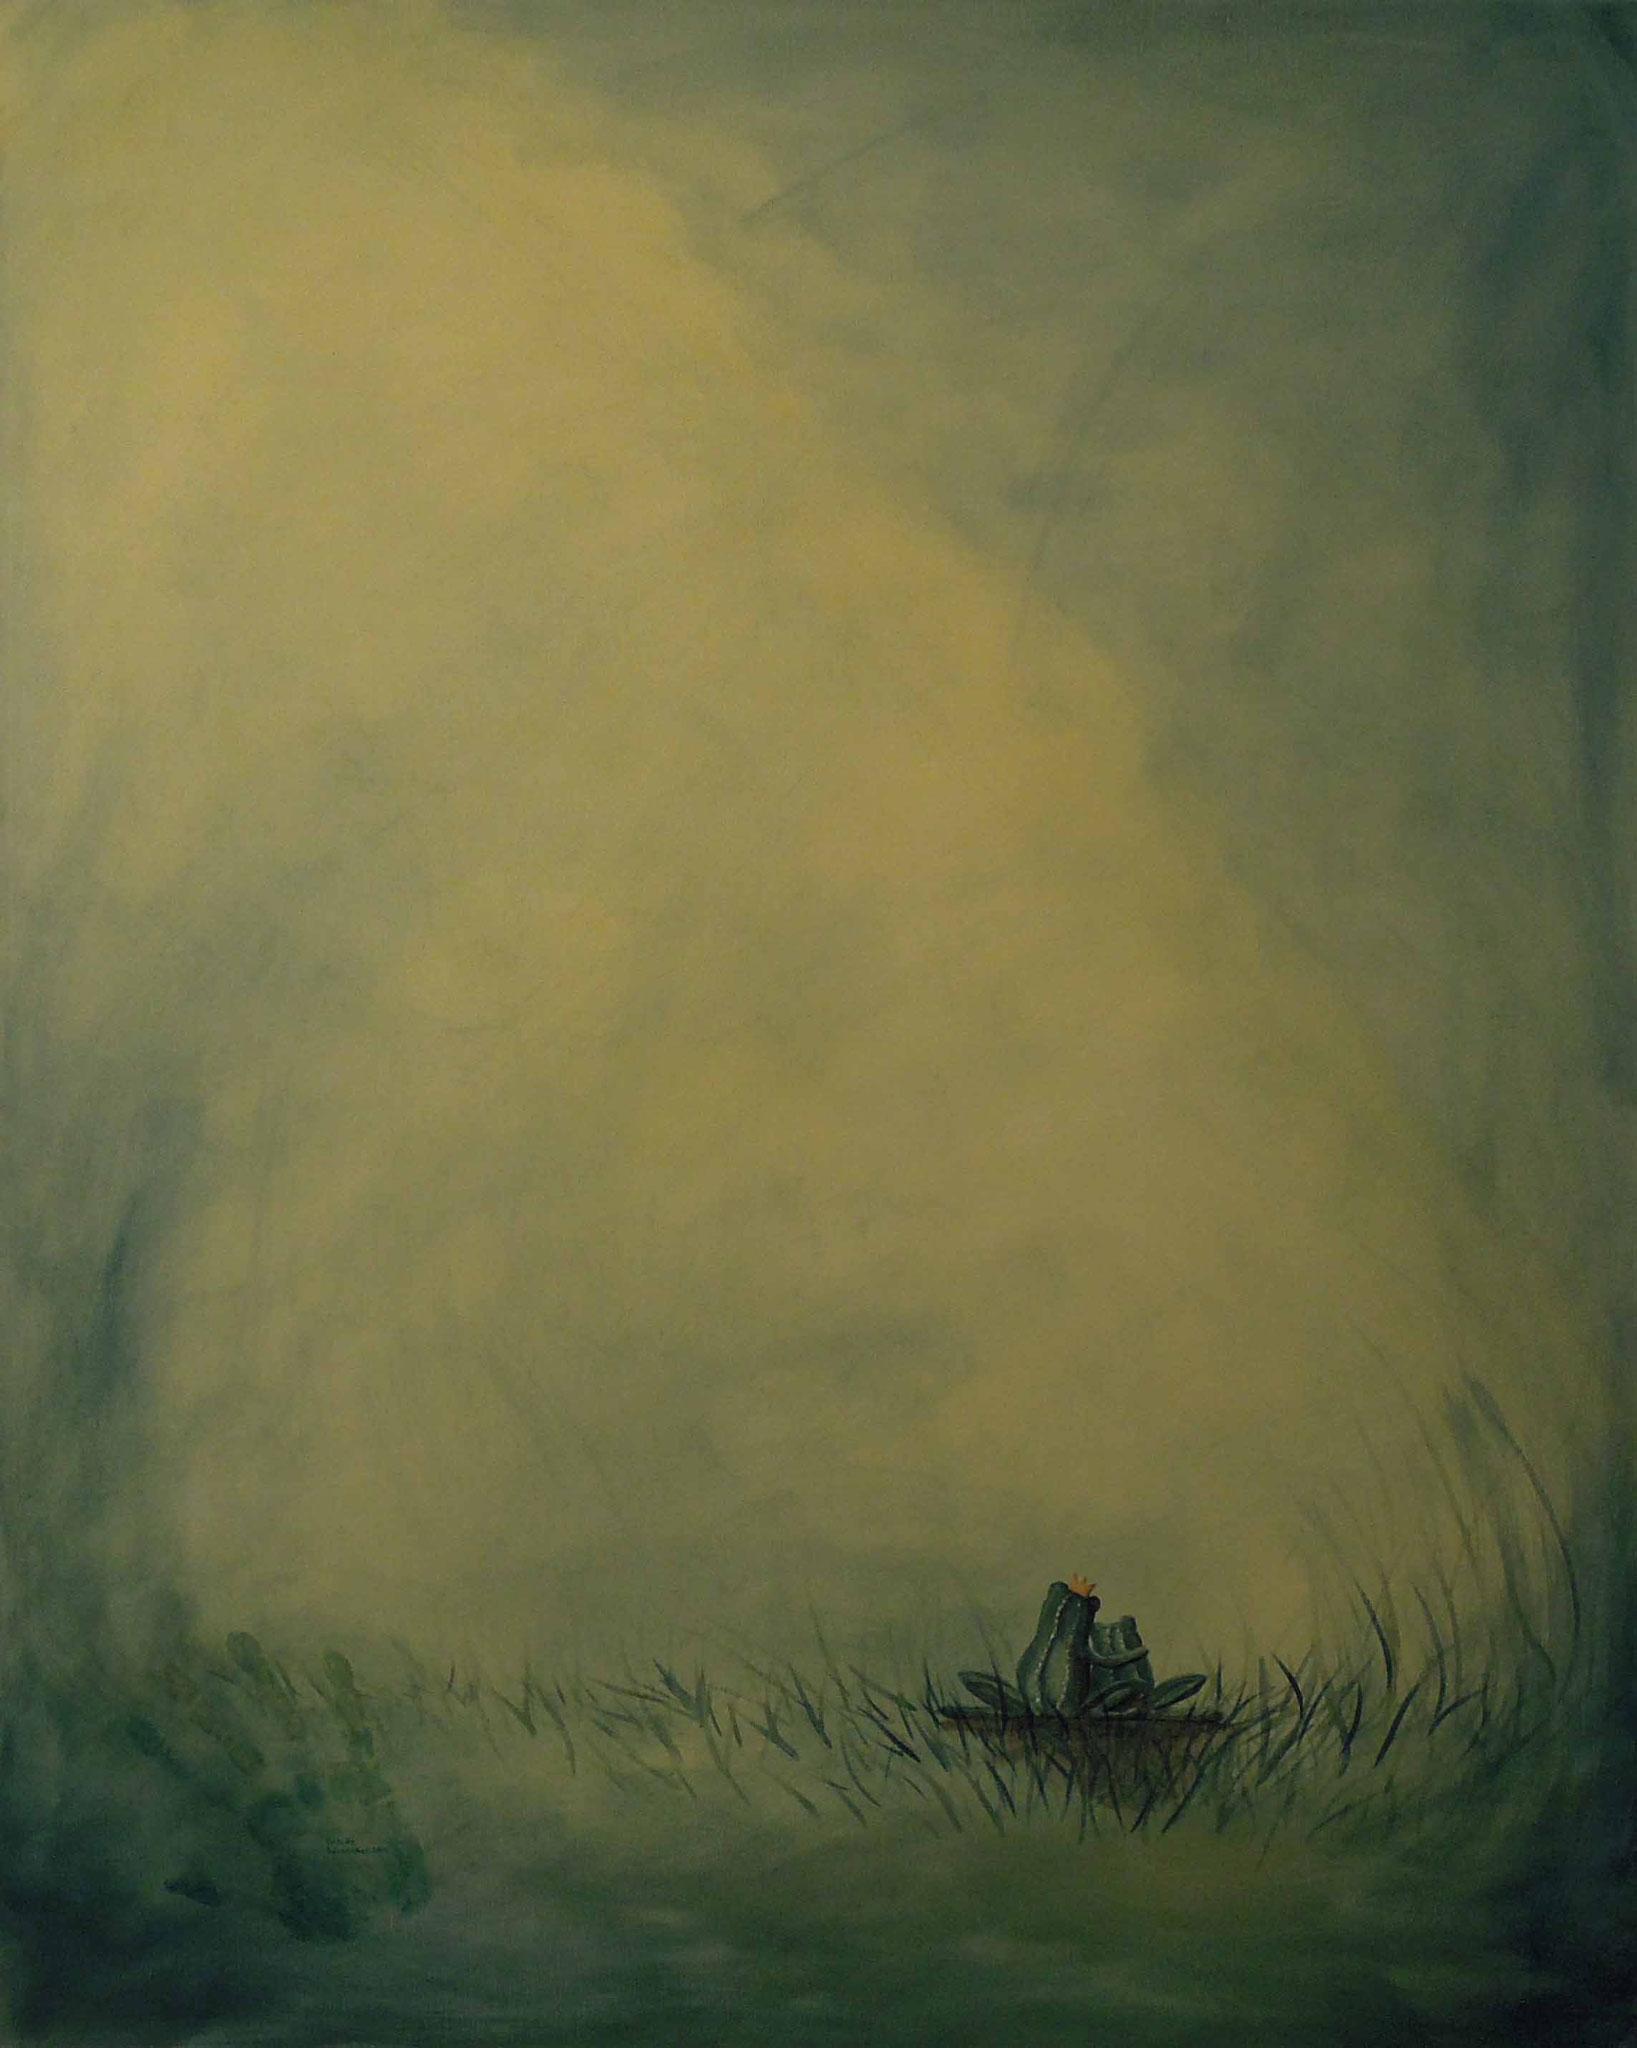 Endless Love - Öl auf Leinwand 80 x 100 cm